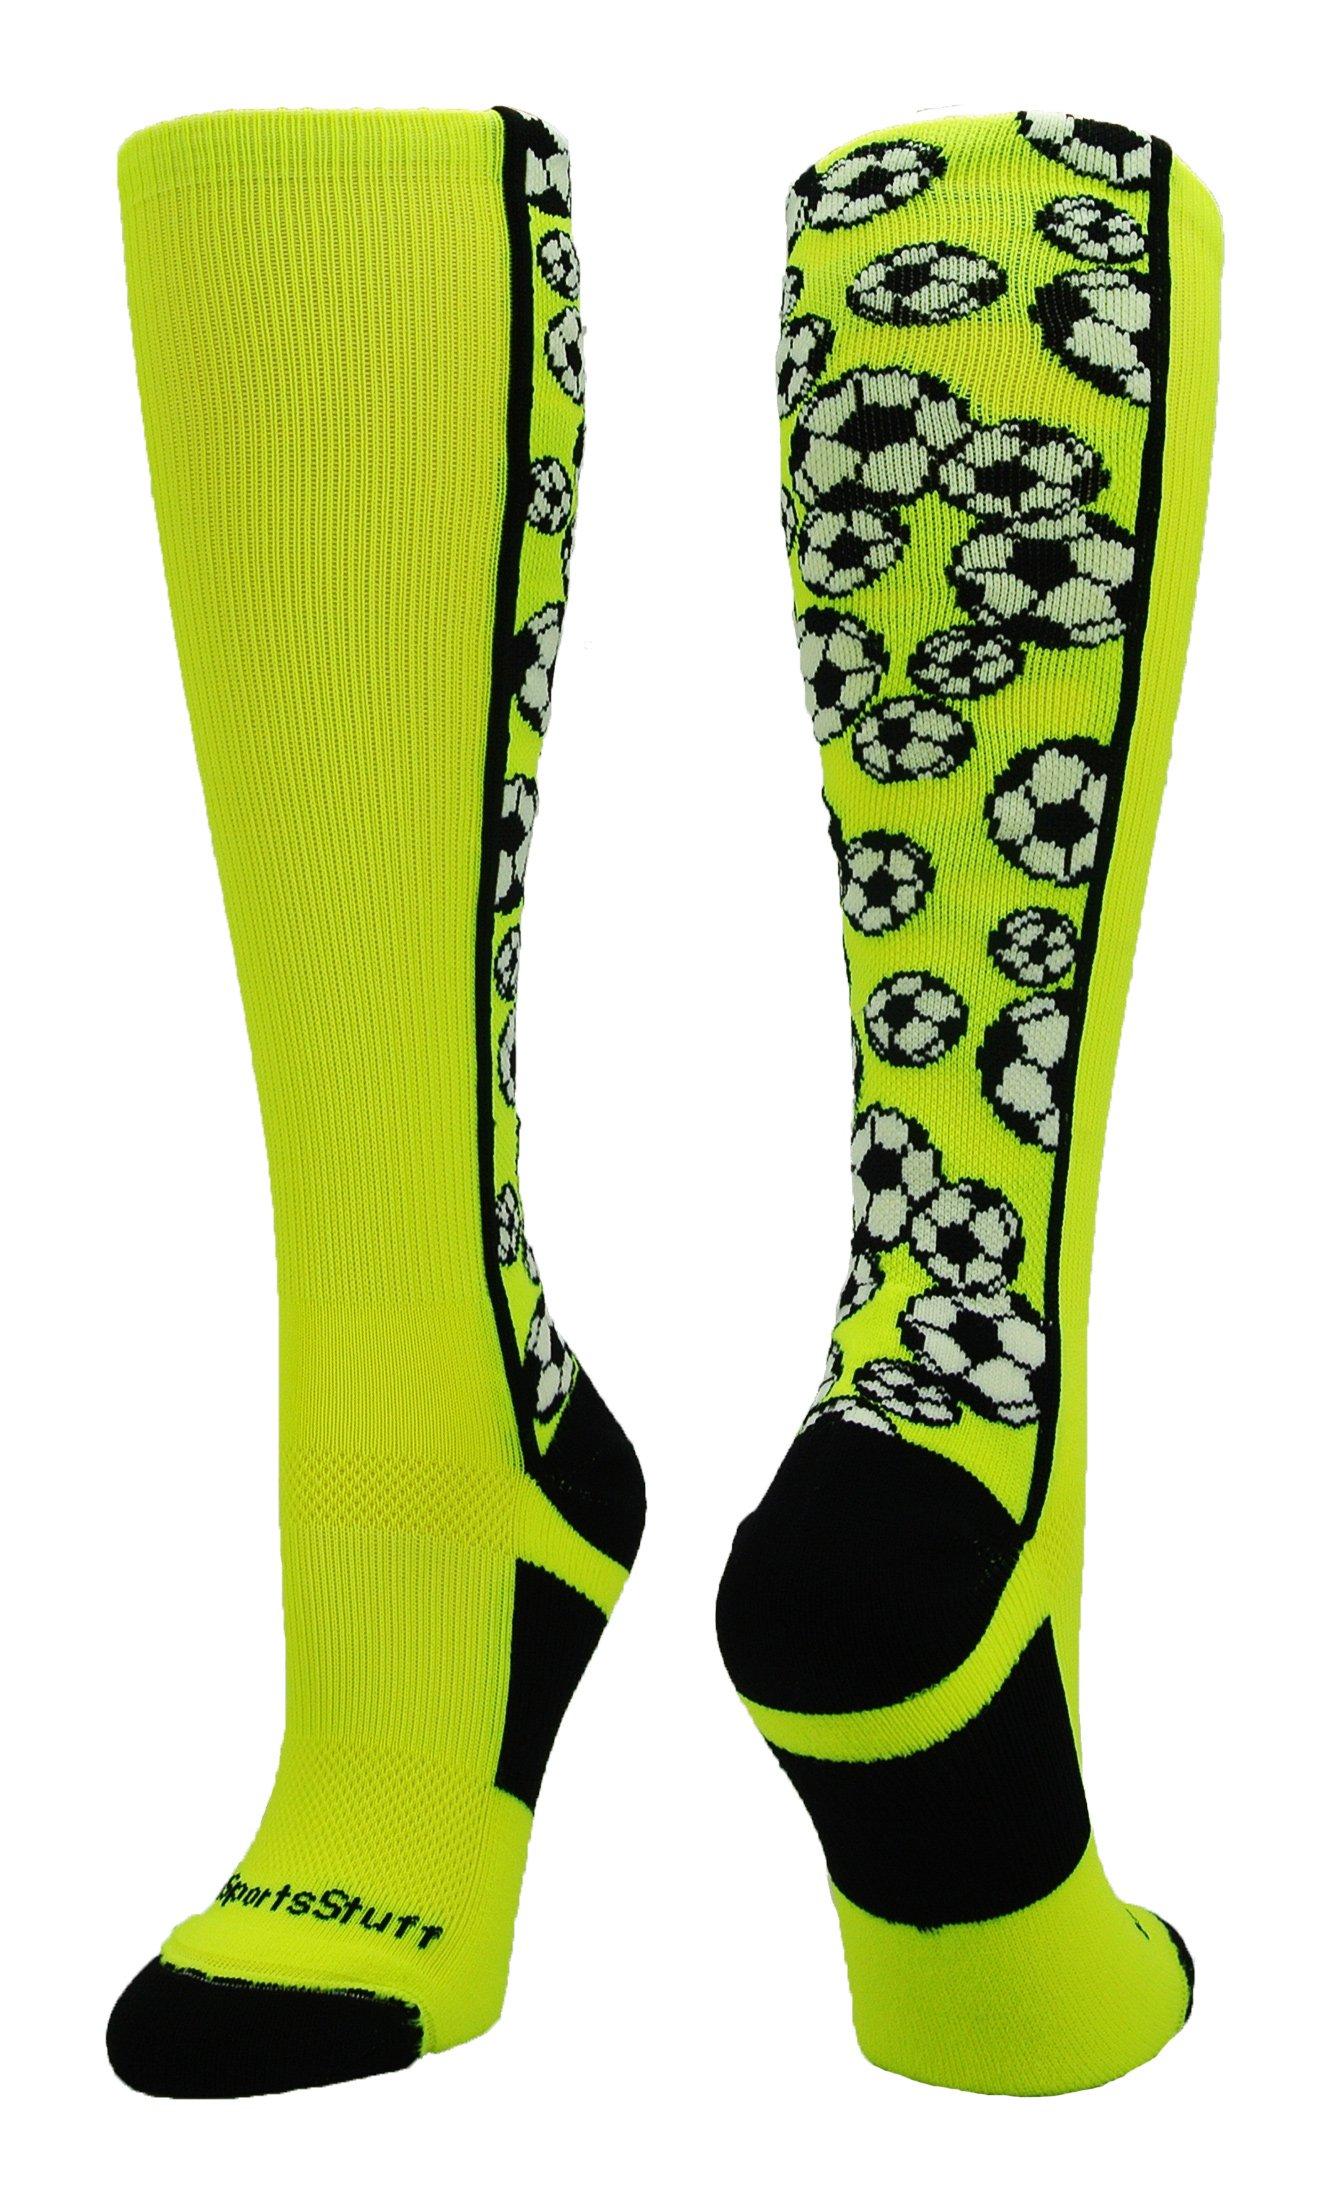 MadSportsStuff Crazy Soccer Socks with Soccer Balls Over The Calf (Neon Yellow/Black, Medium) by MadSportsStuff